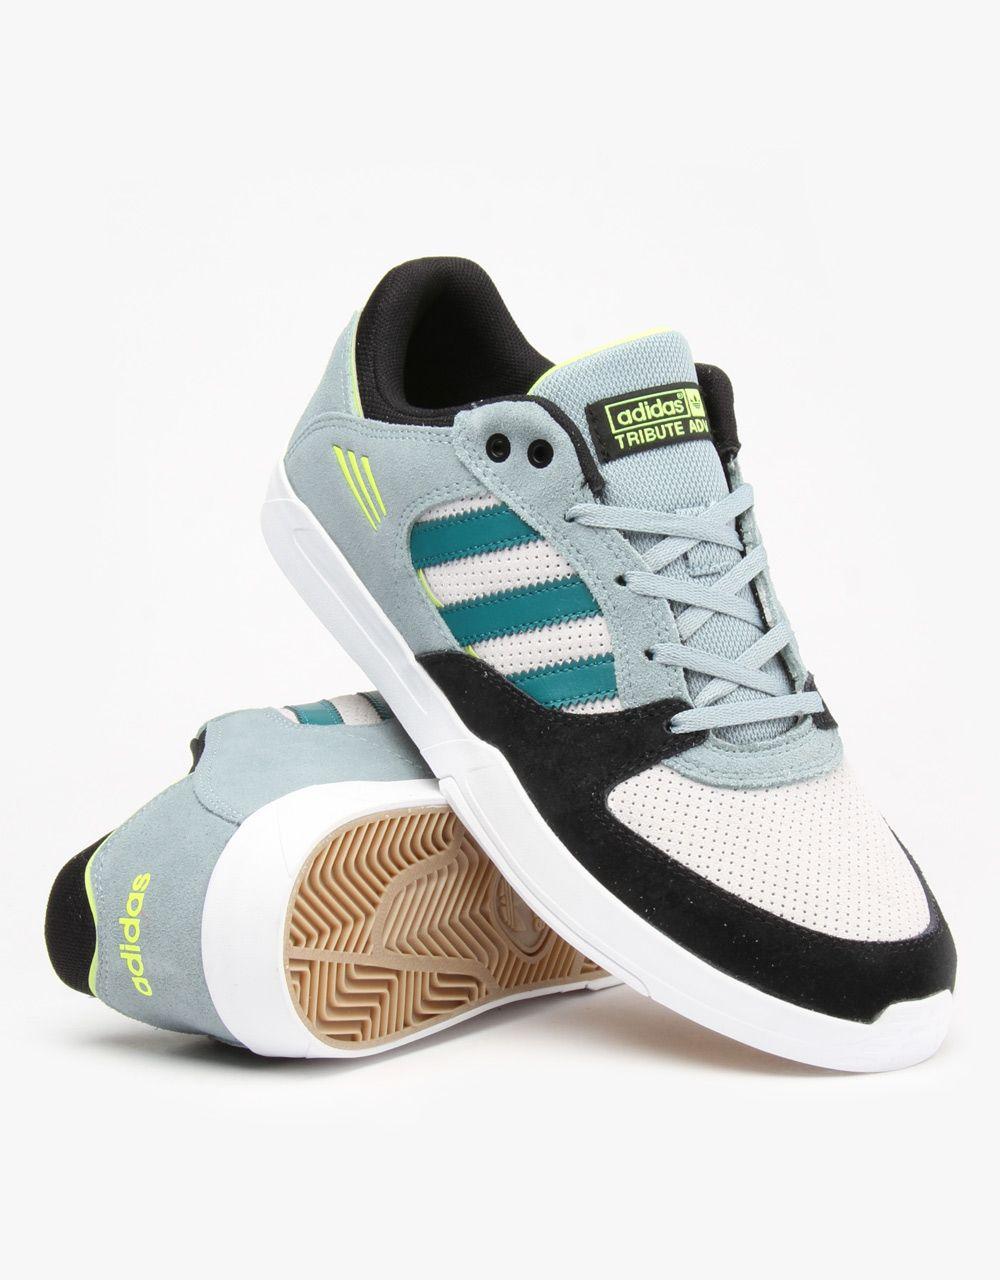 Adidas Tribute ADV Skate Shoes - Green Earth/Core Black/Solar Yellow